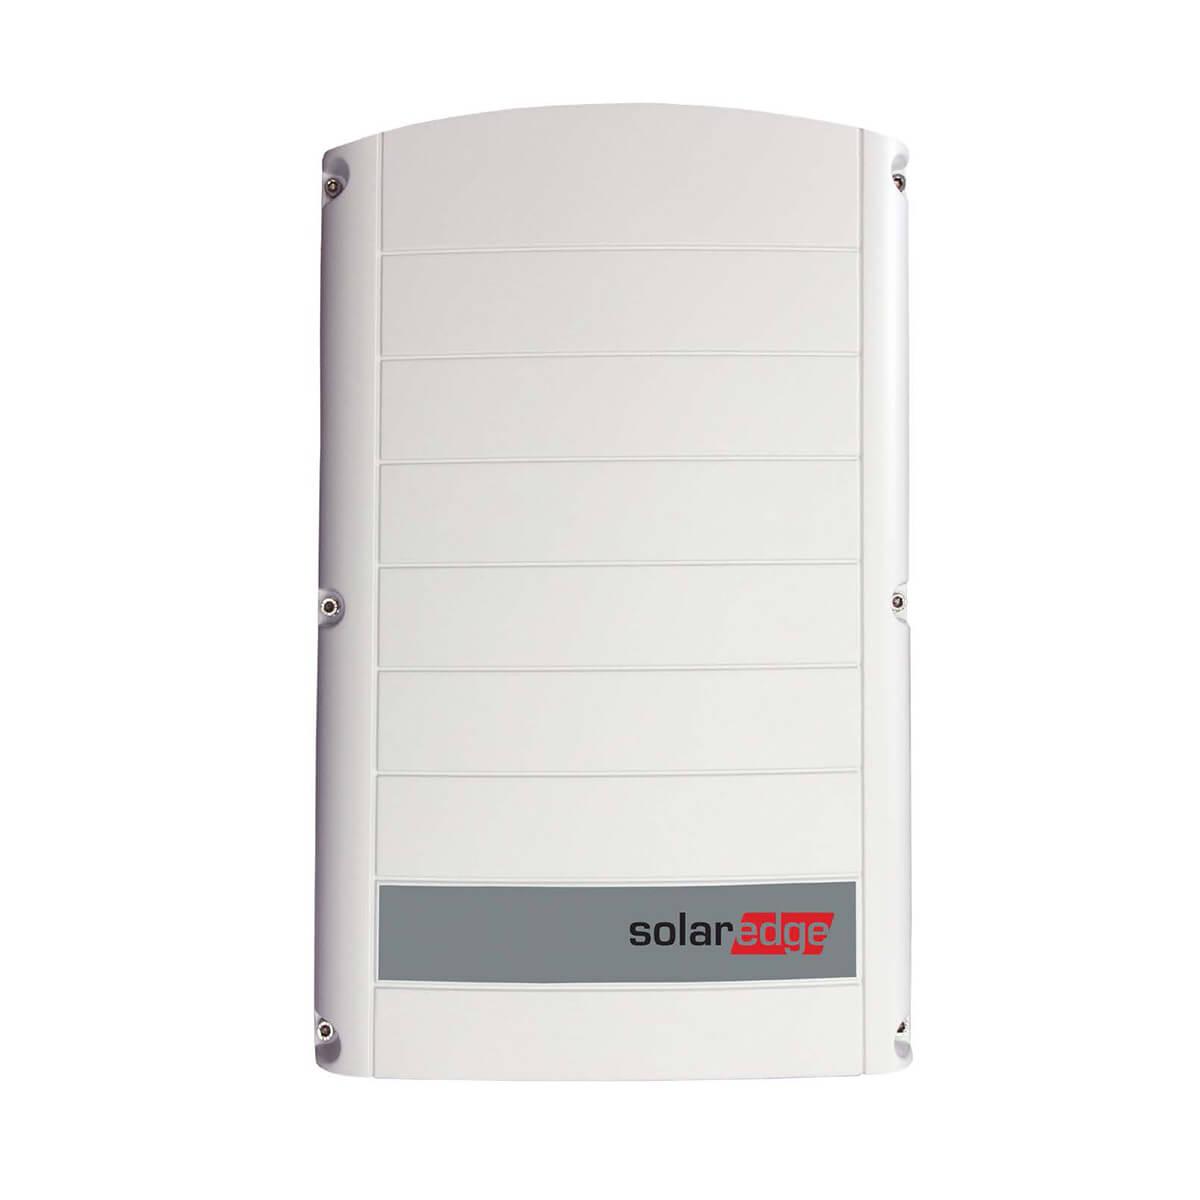 solaredge 4kW inverter, solaredge se4k 4kW inverter, solaredge se4k inverter, solaredge se4k, solaredge 4 kW